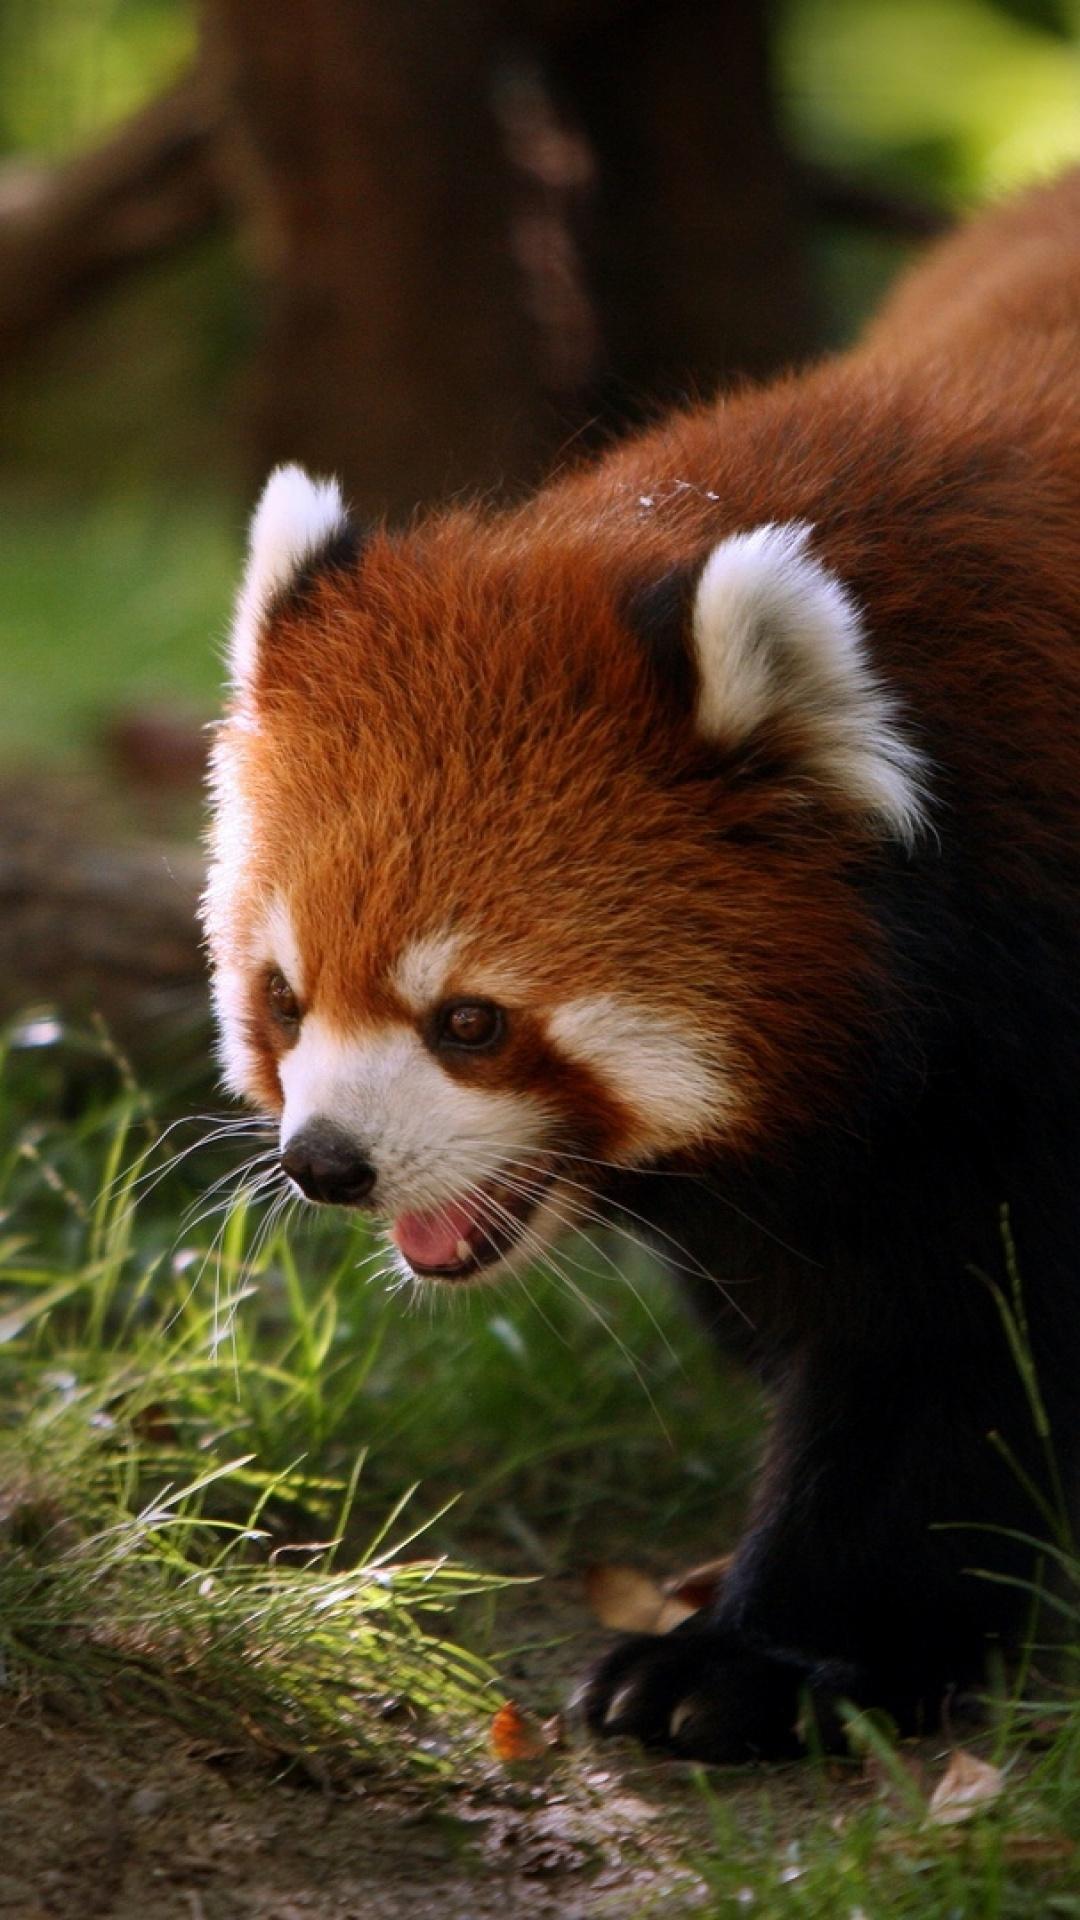 Popular Wallpaper Mobile Animal - red-panda-firefox-forest-animal-cute  Trends_359219.jpg